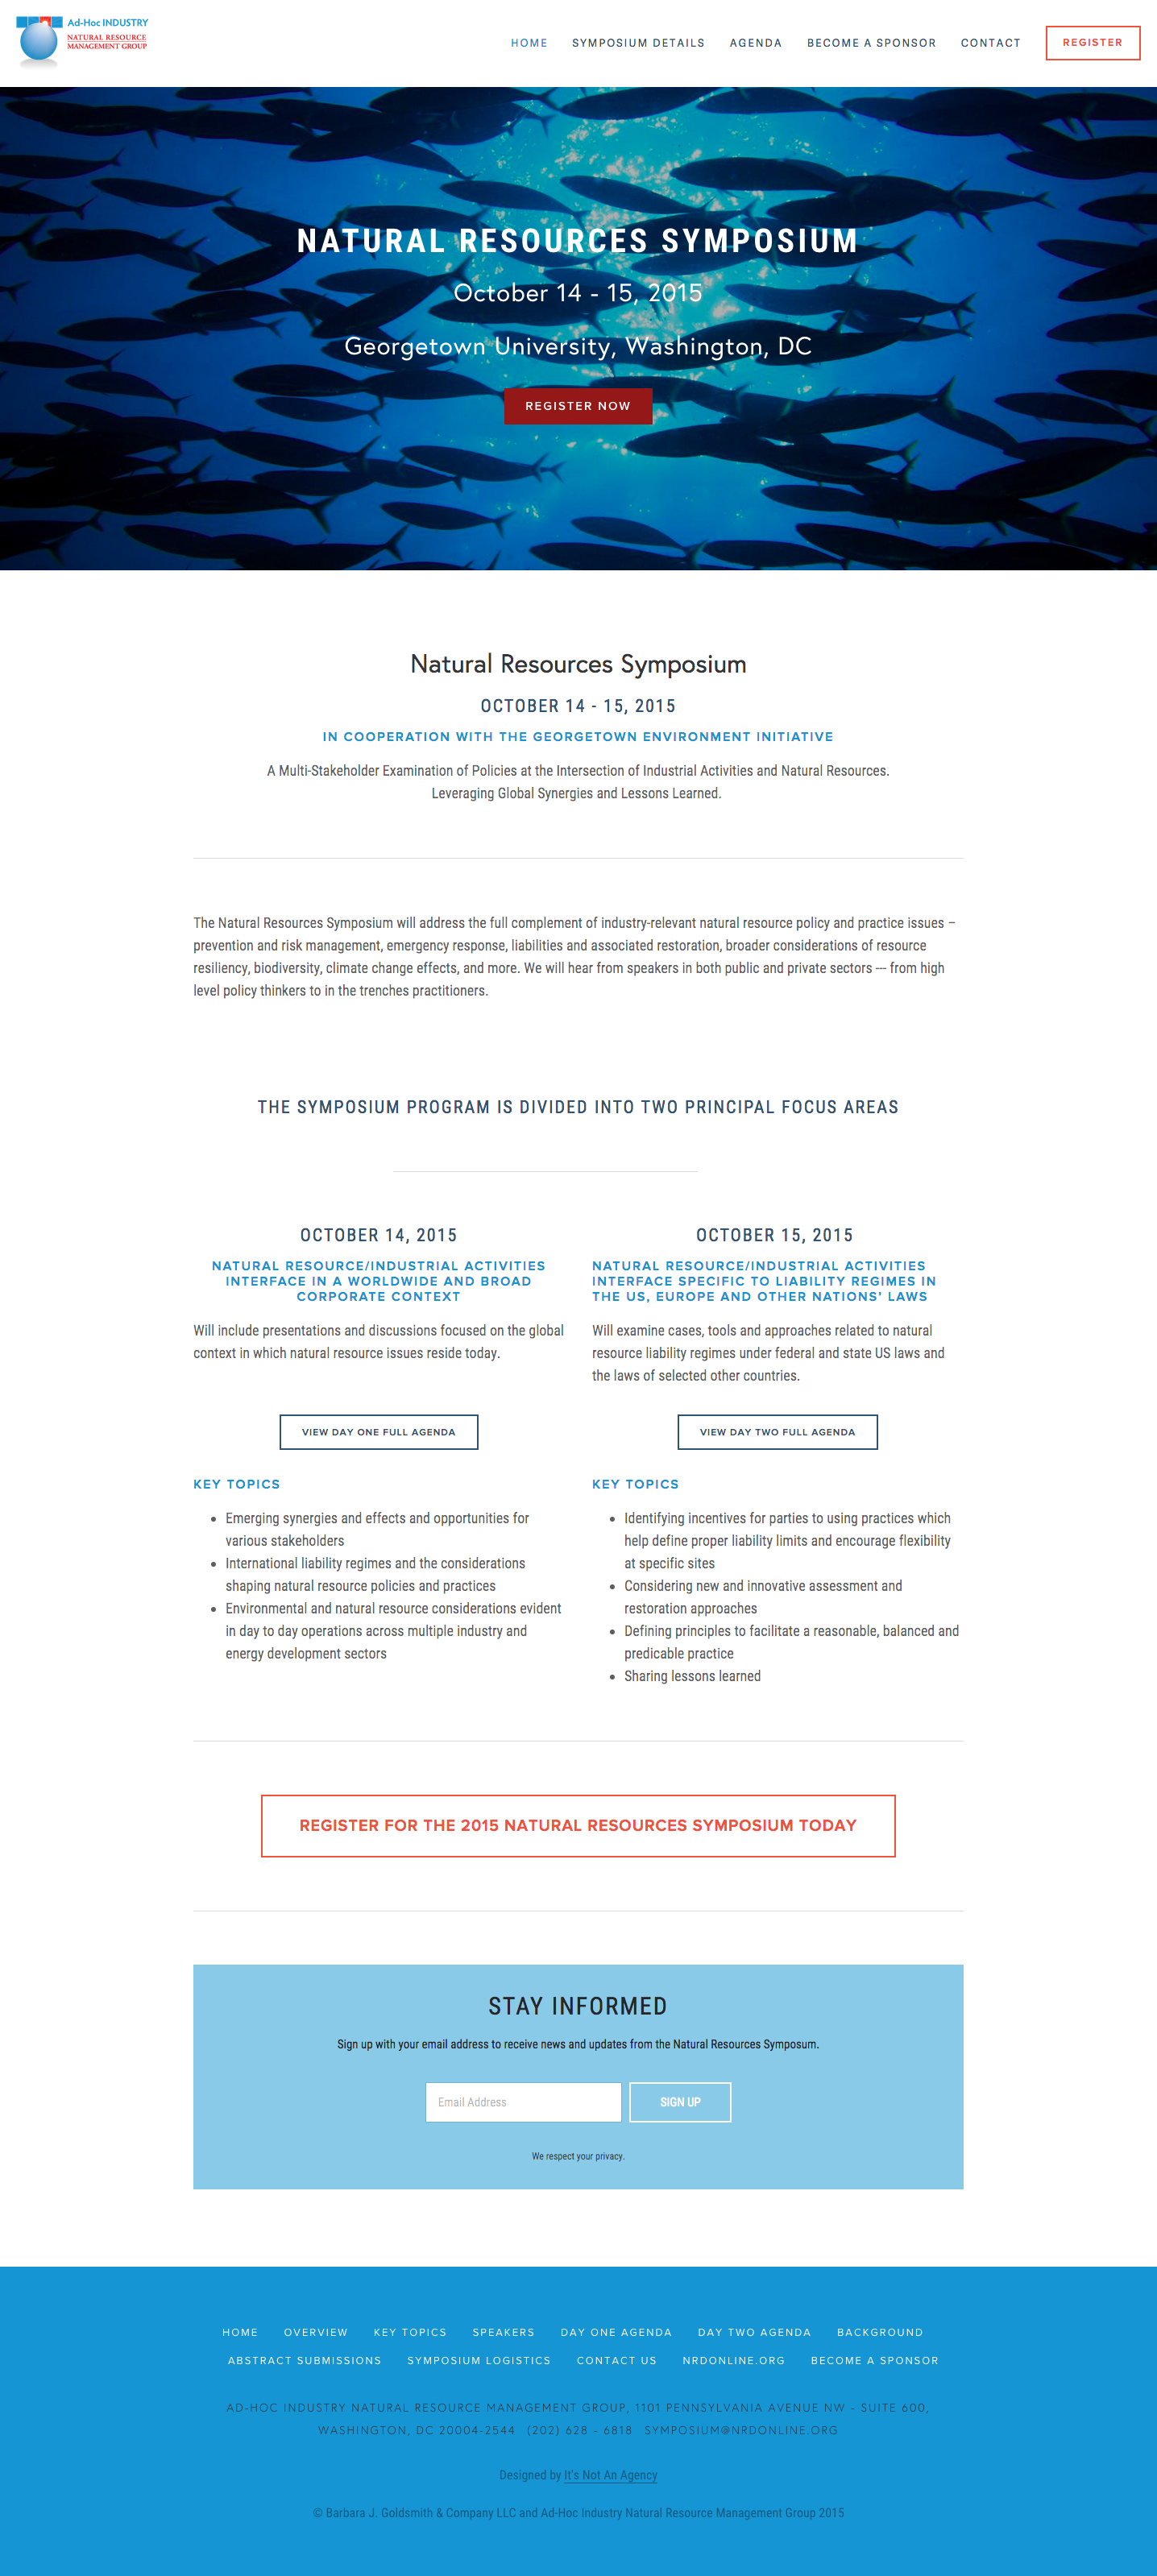 Event Website Design_Natural Resources Symposium1.png